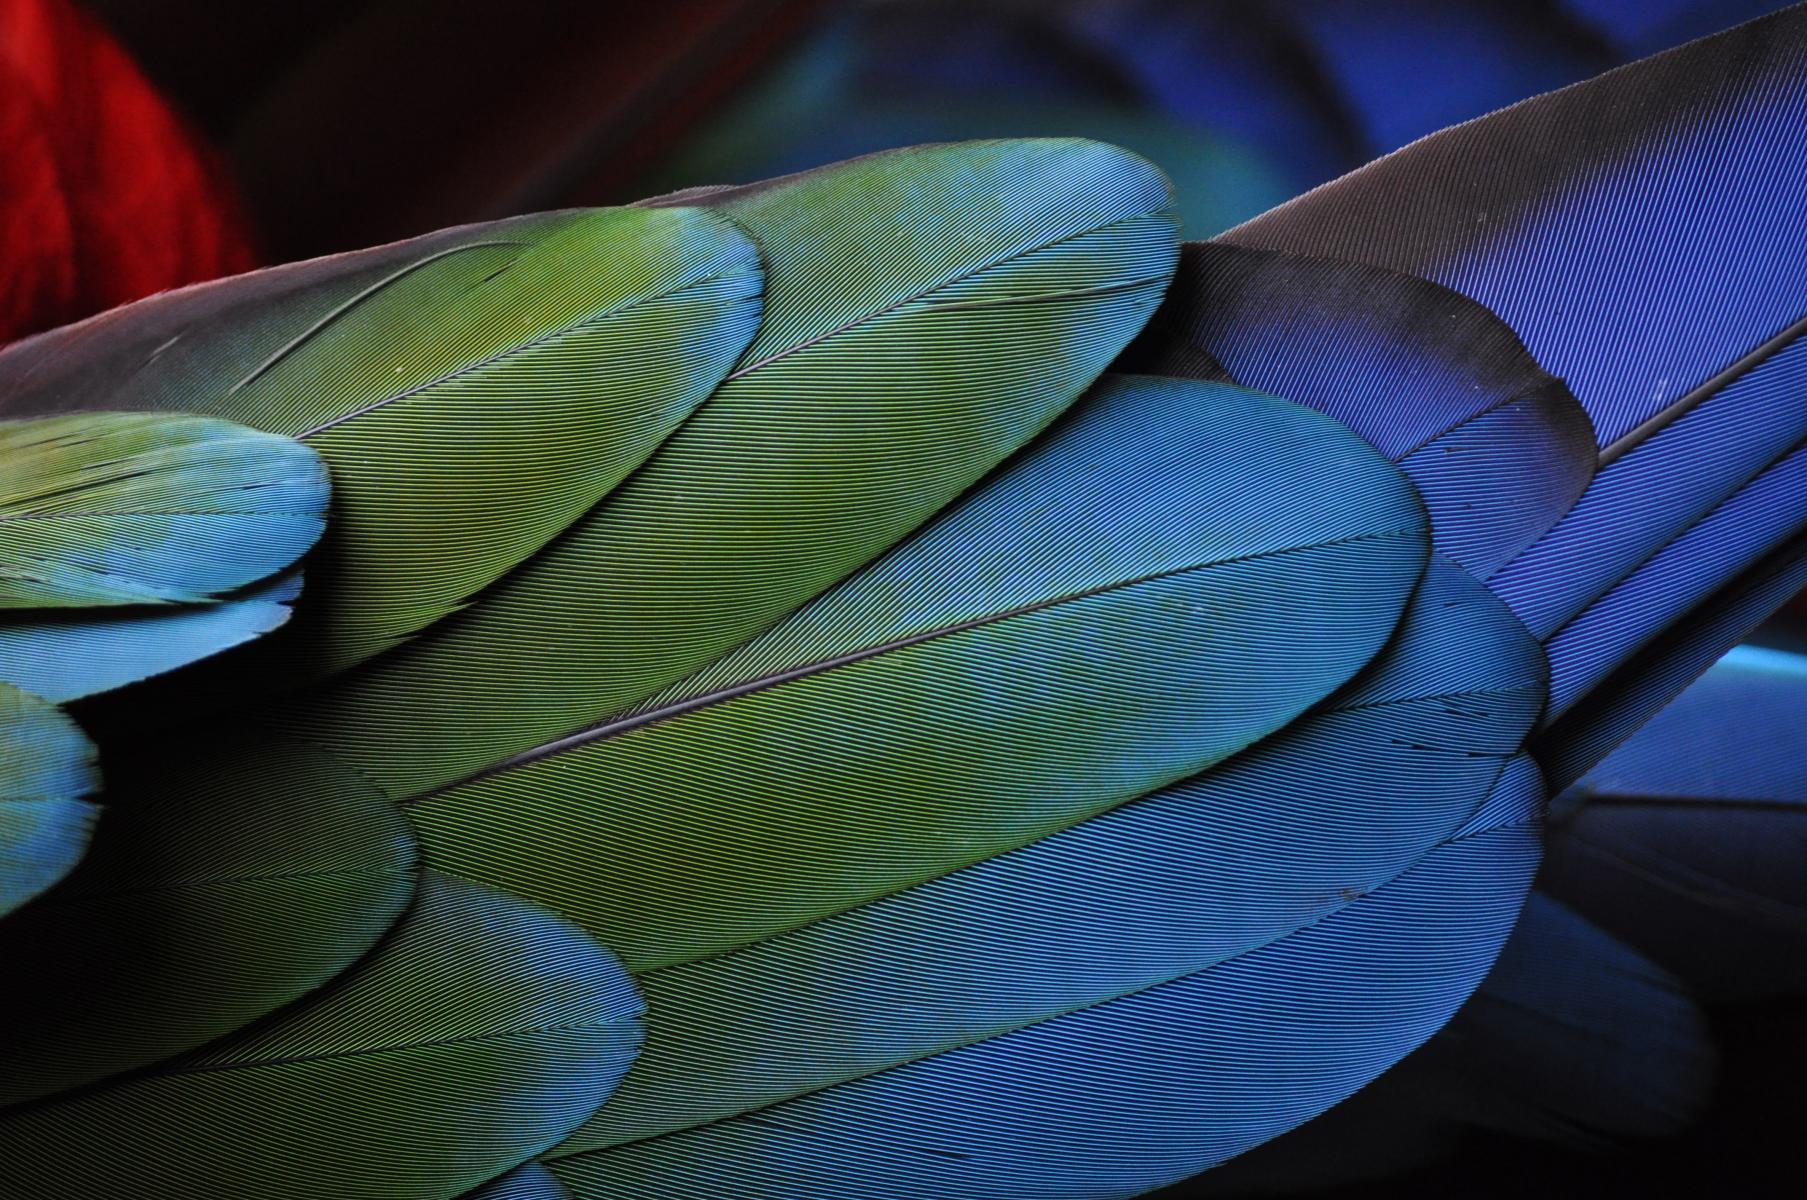 Still I rise wing | Photo by photostockeditor on Unsplash